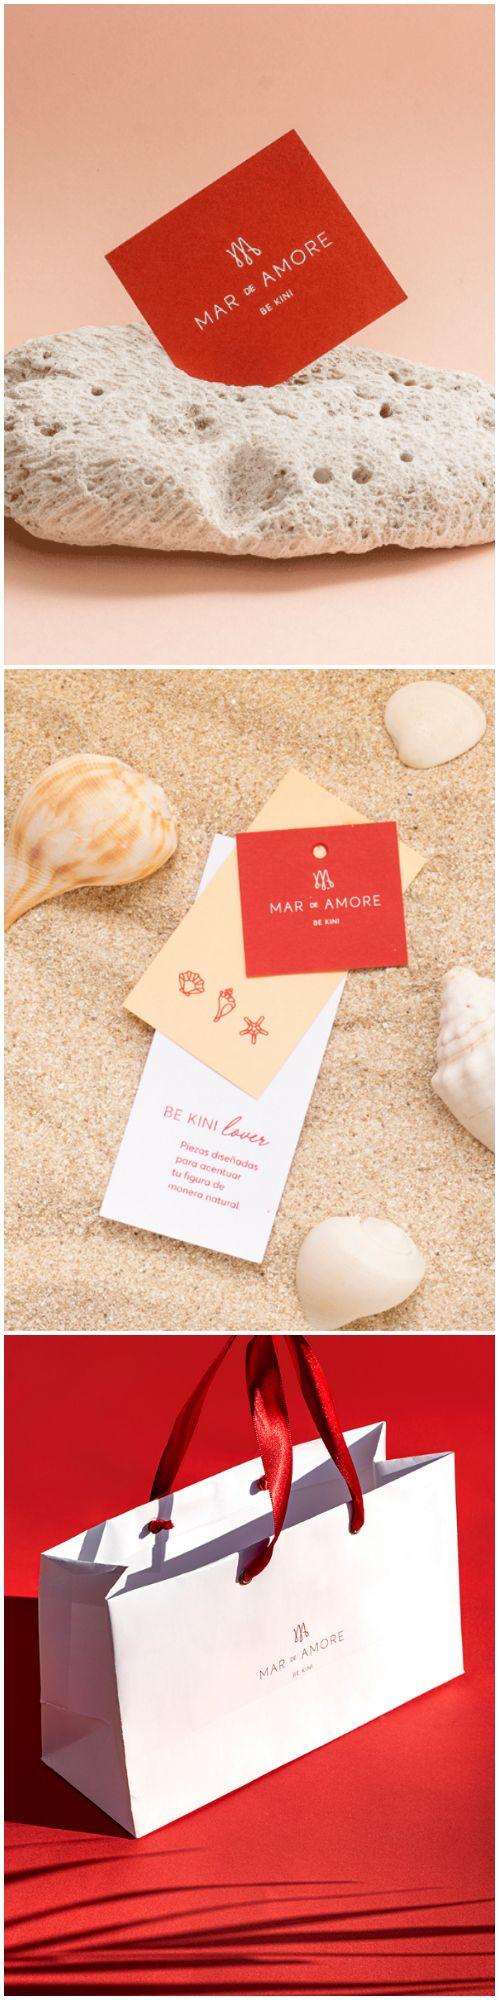 Savia - Mar de Amore #bikini / Submit: worldbranddesign.com/submit - World Brand Design Society